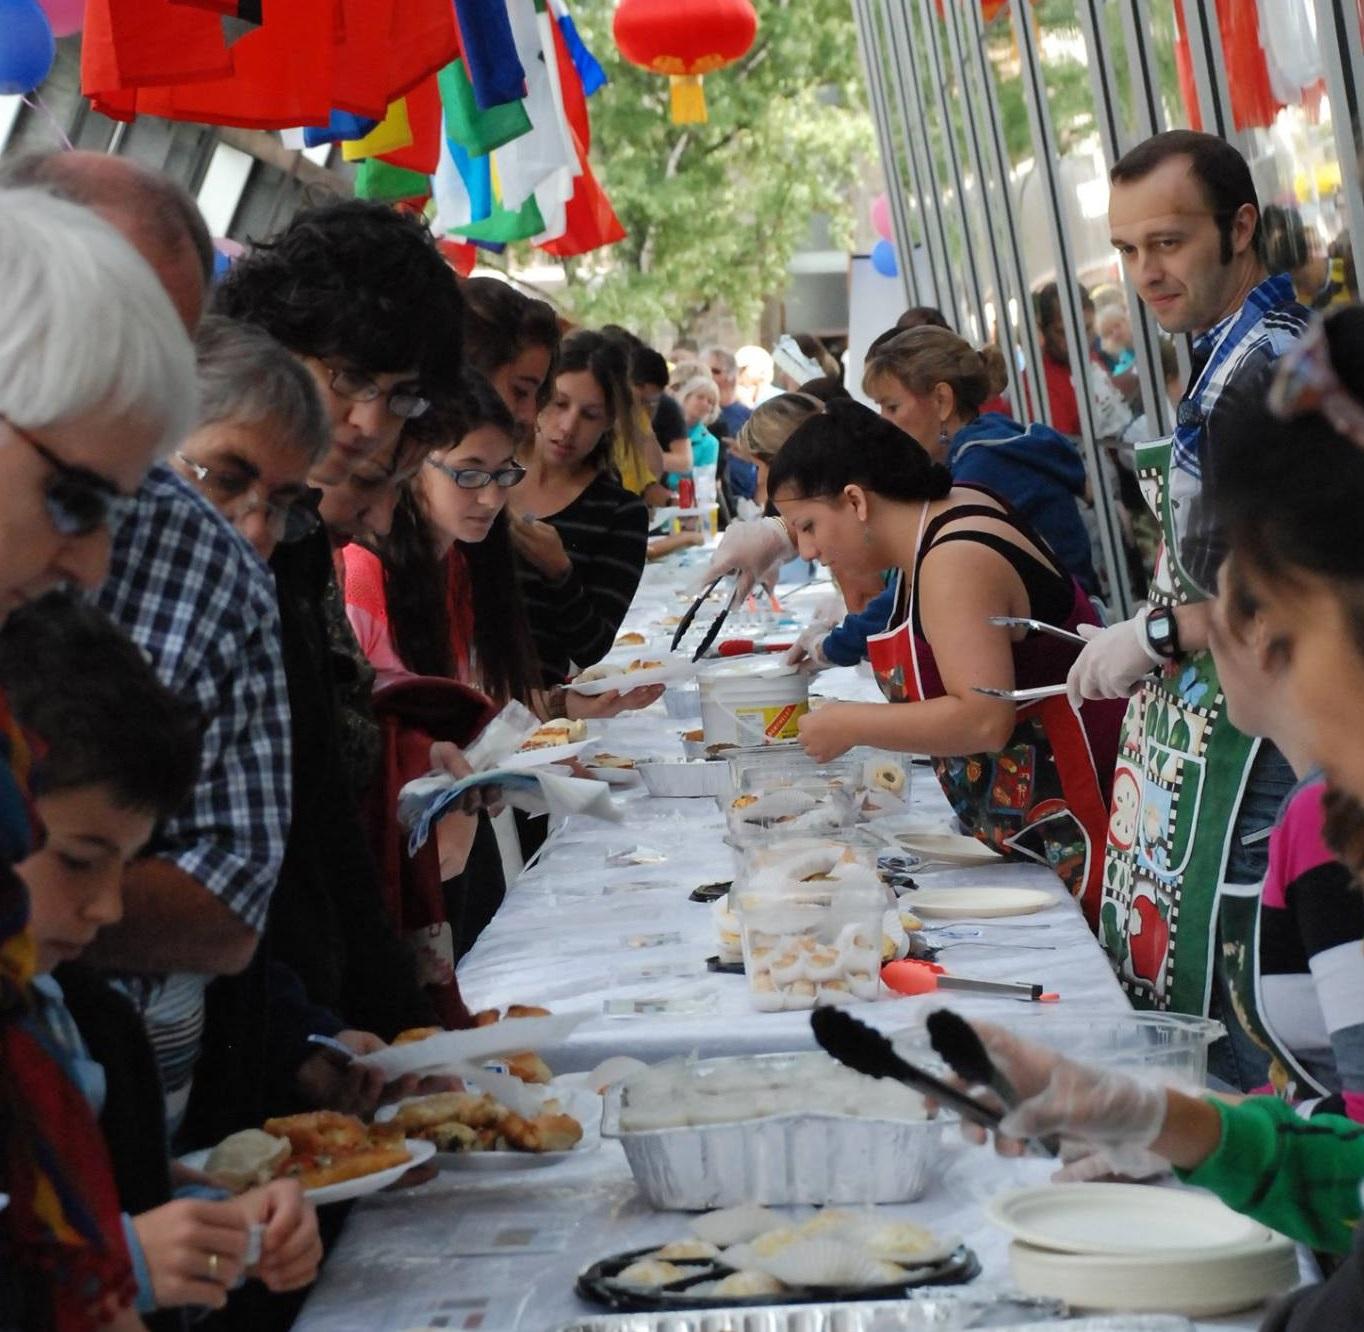 Festival interculturel